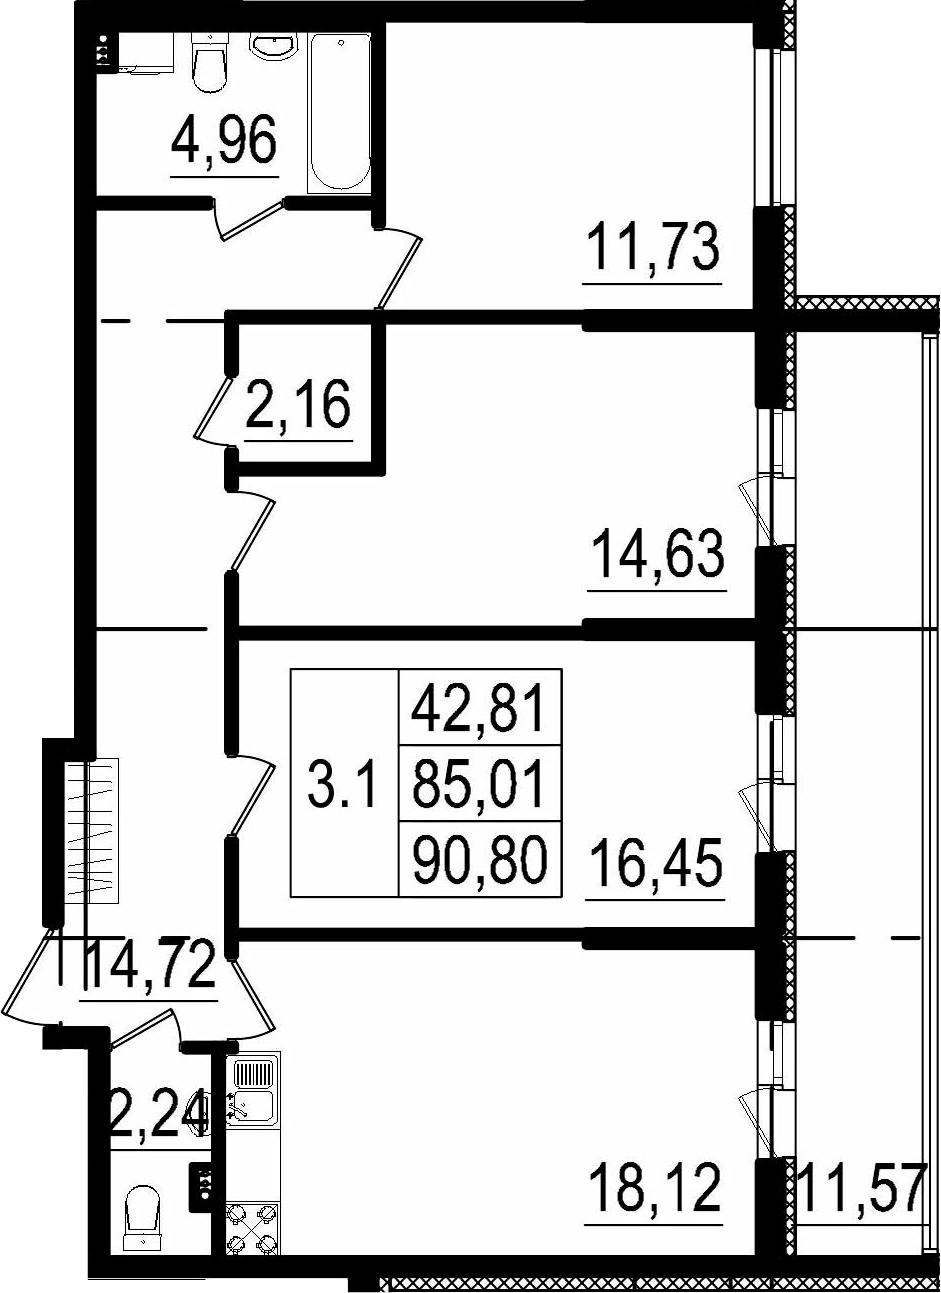 4Е-к.кв, 85.01 м²